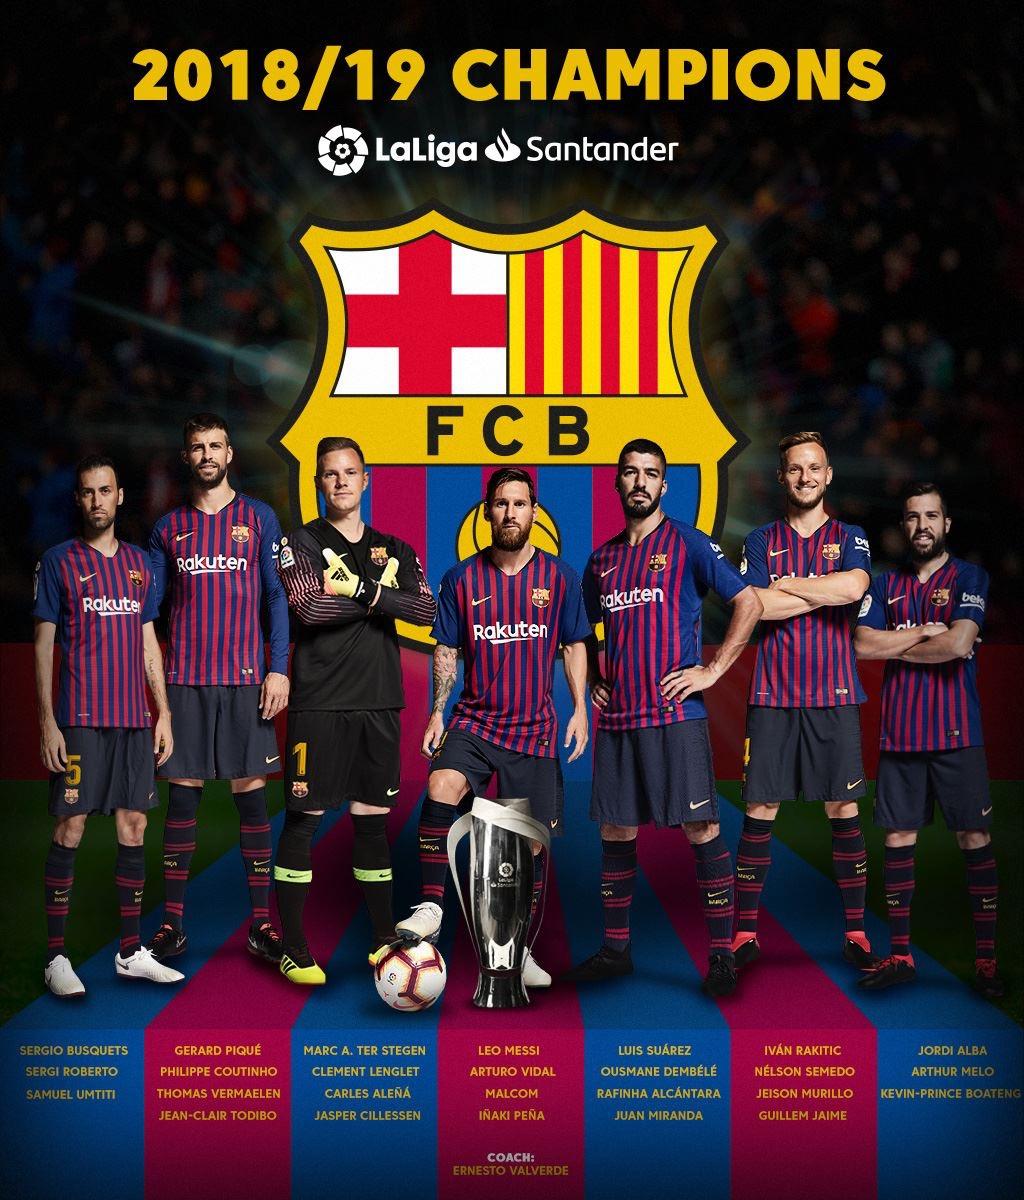 FC Barcelone - Page 24 1750-819aaff2-d36d-40bc-b59e-8e50254a9bd8-jpeg